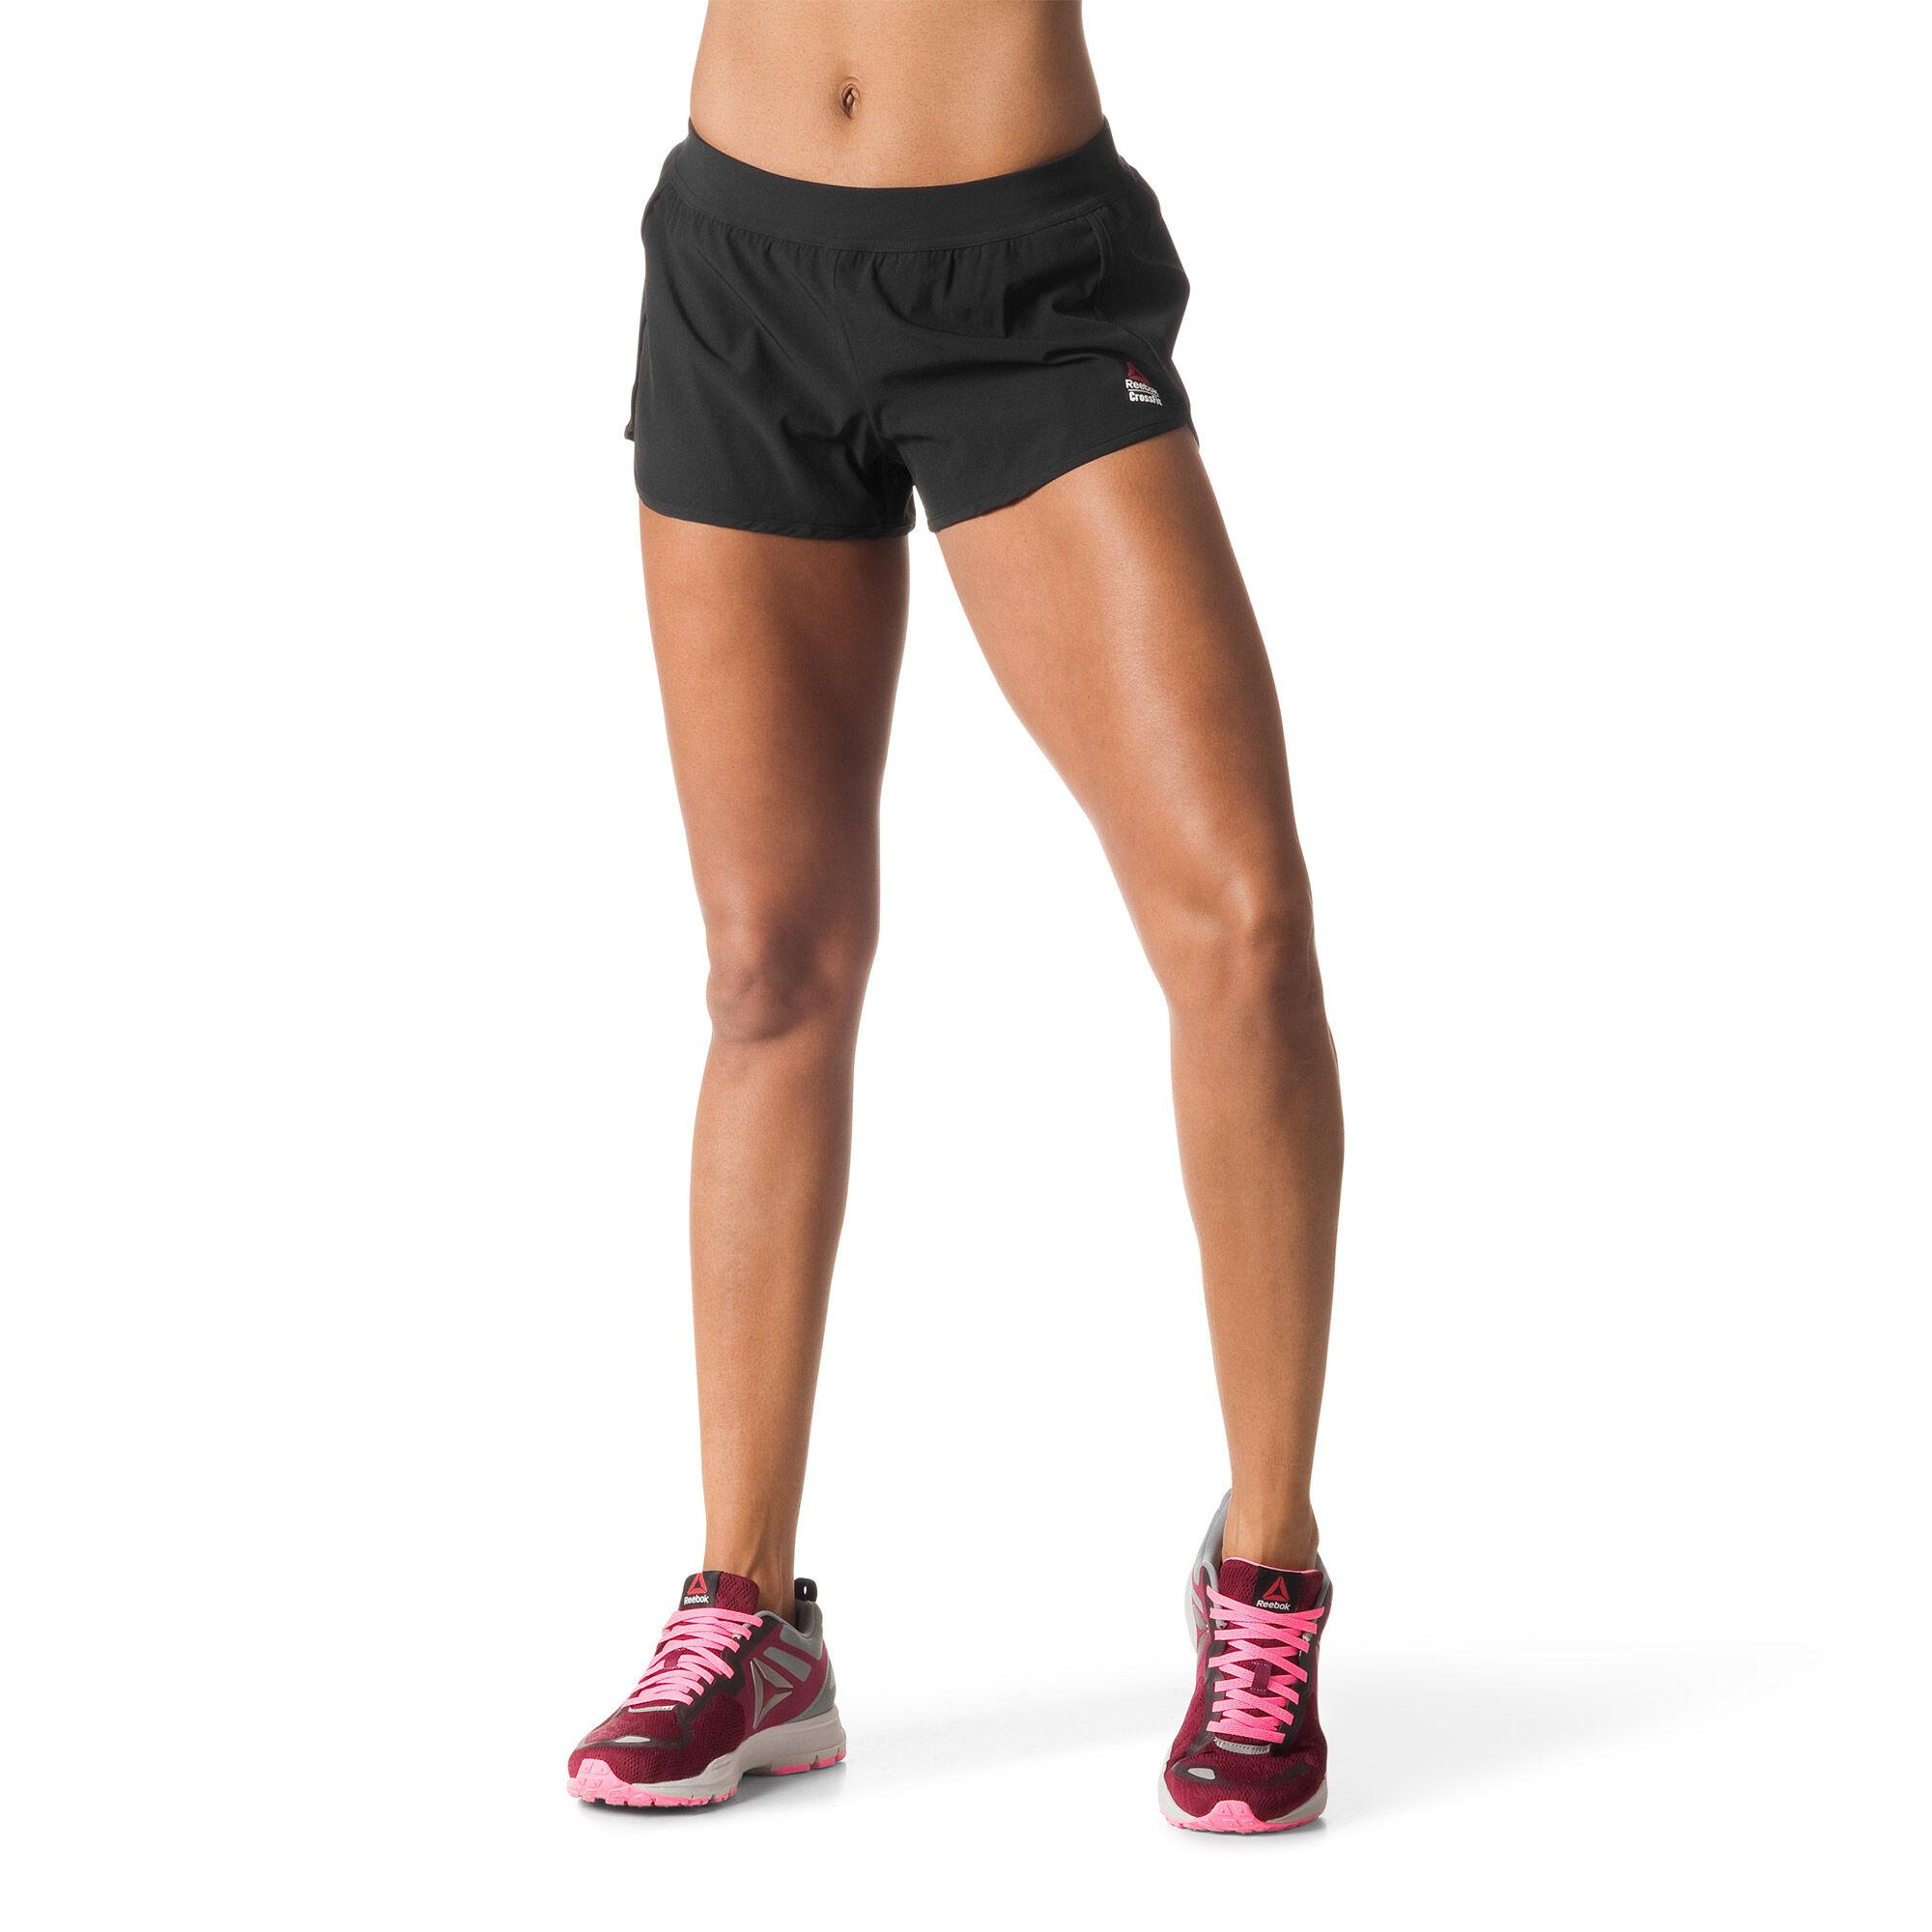 Reebok - Reebok CrossFit Ass To Ankle Short Black BK1094